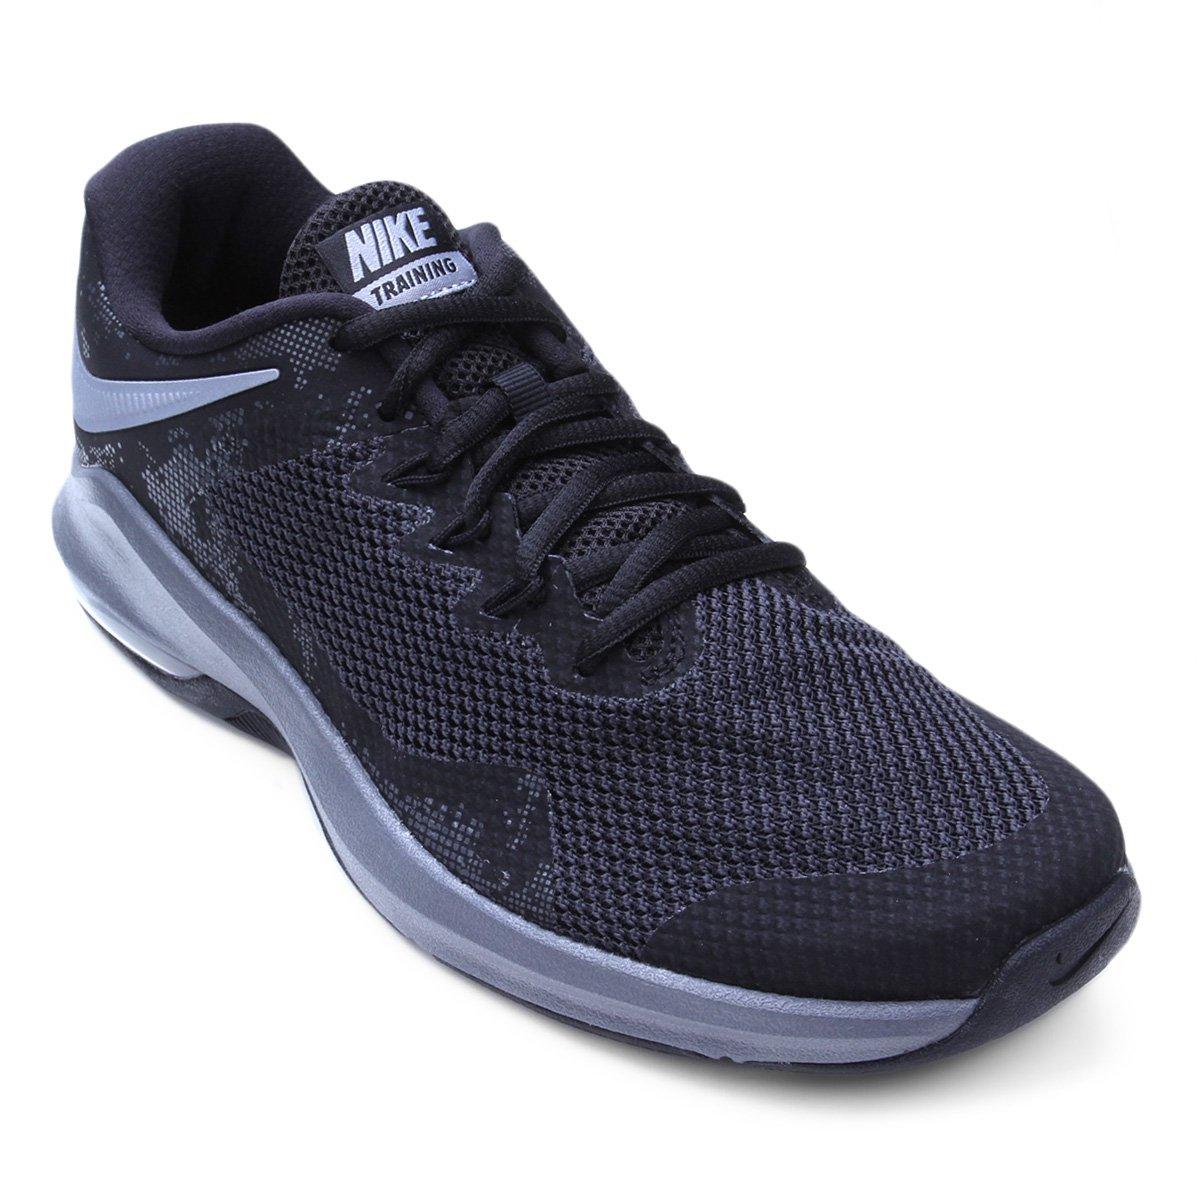 4b6ebe8926 Tênis Nike Air Max Alpha Trainer Masculino - Preto e Cinza | Shop Timão